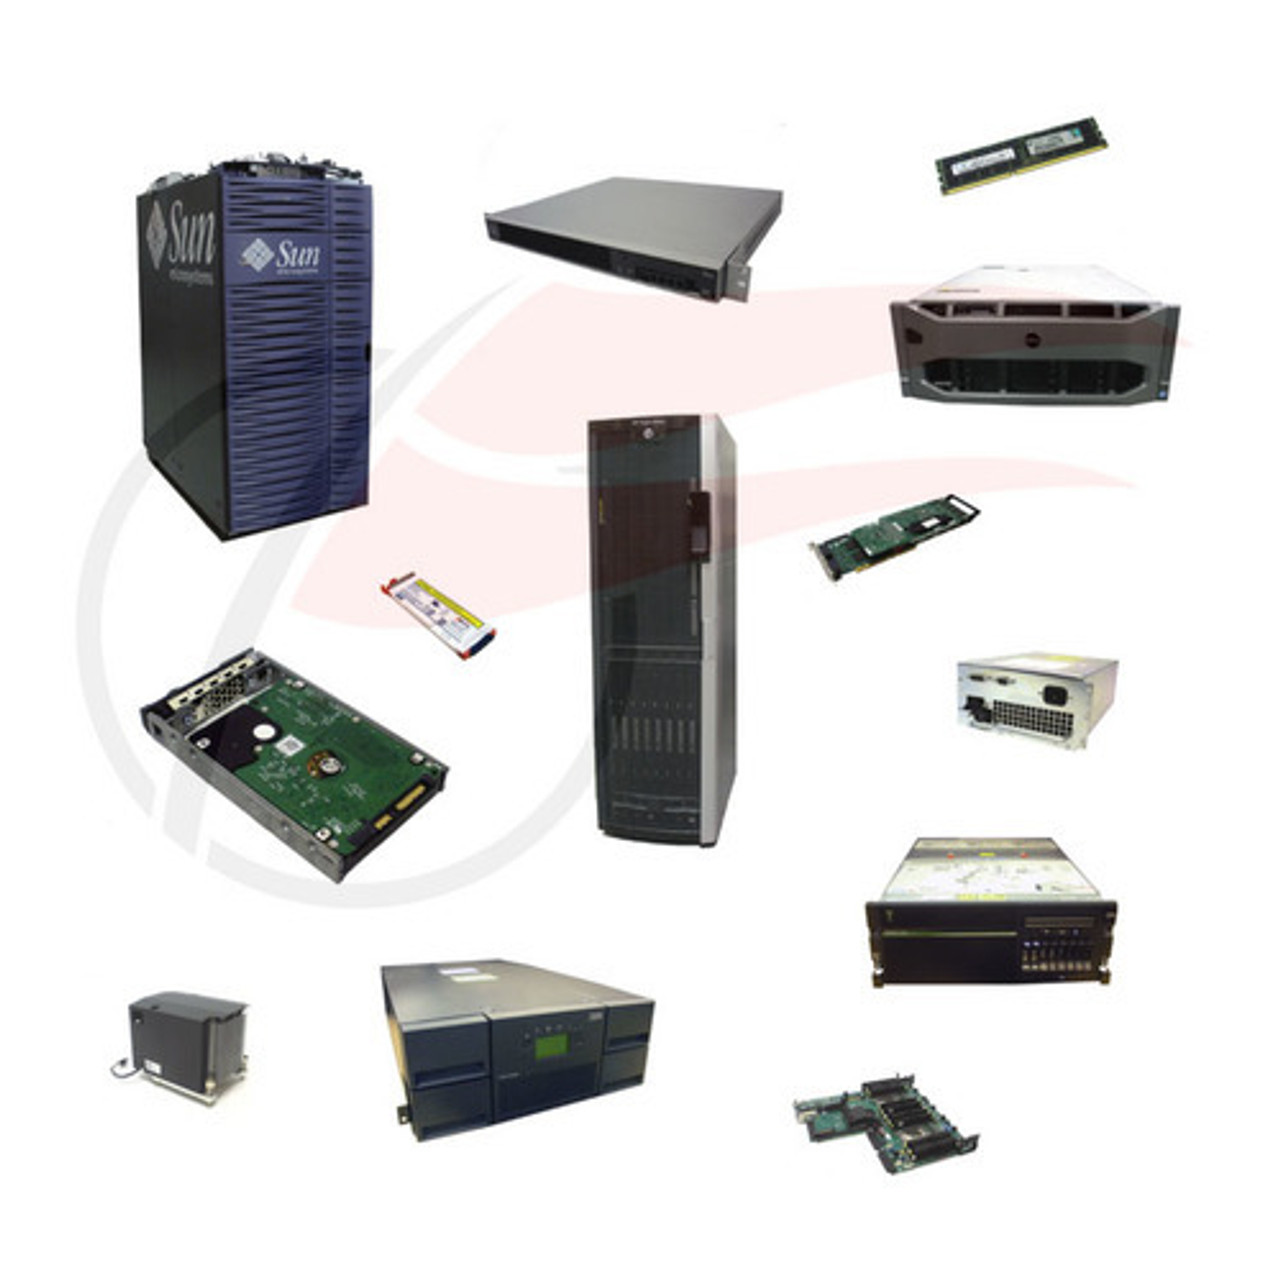 IBM Power System IT Hardware